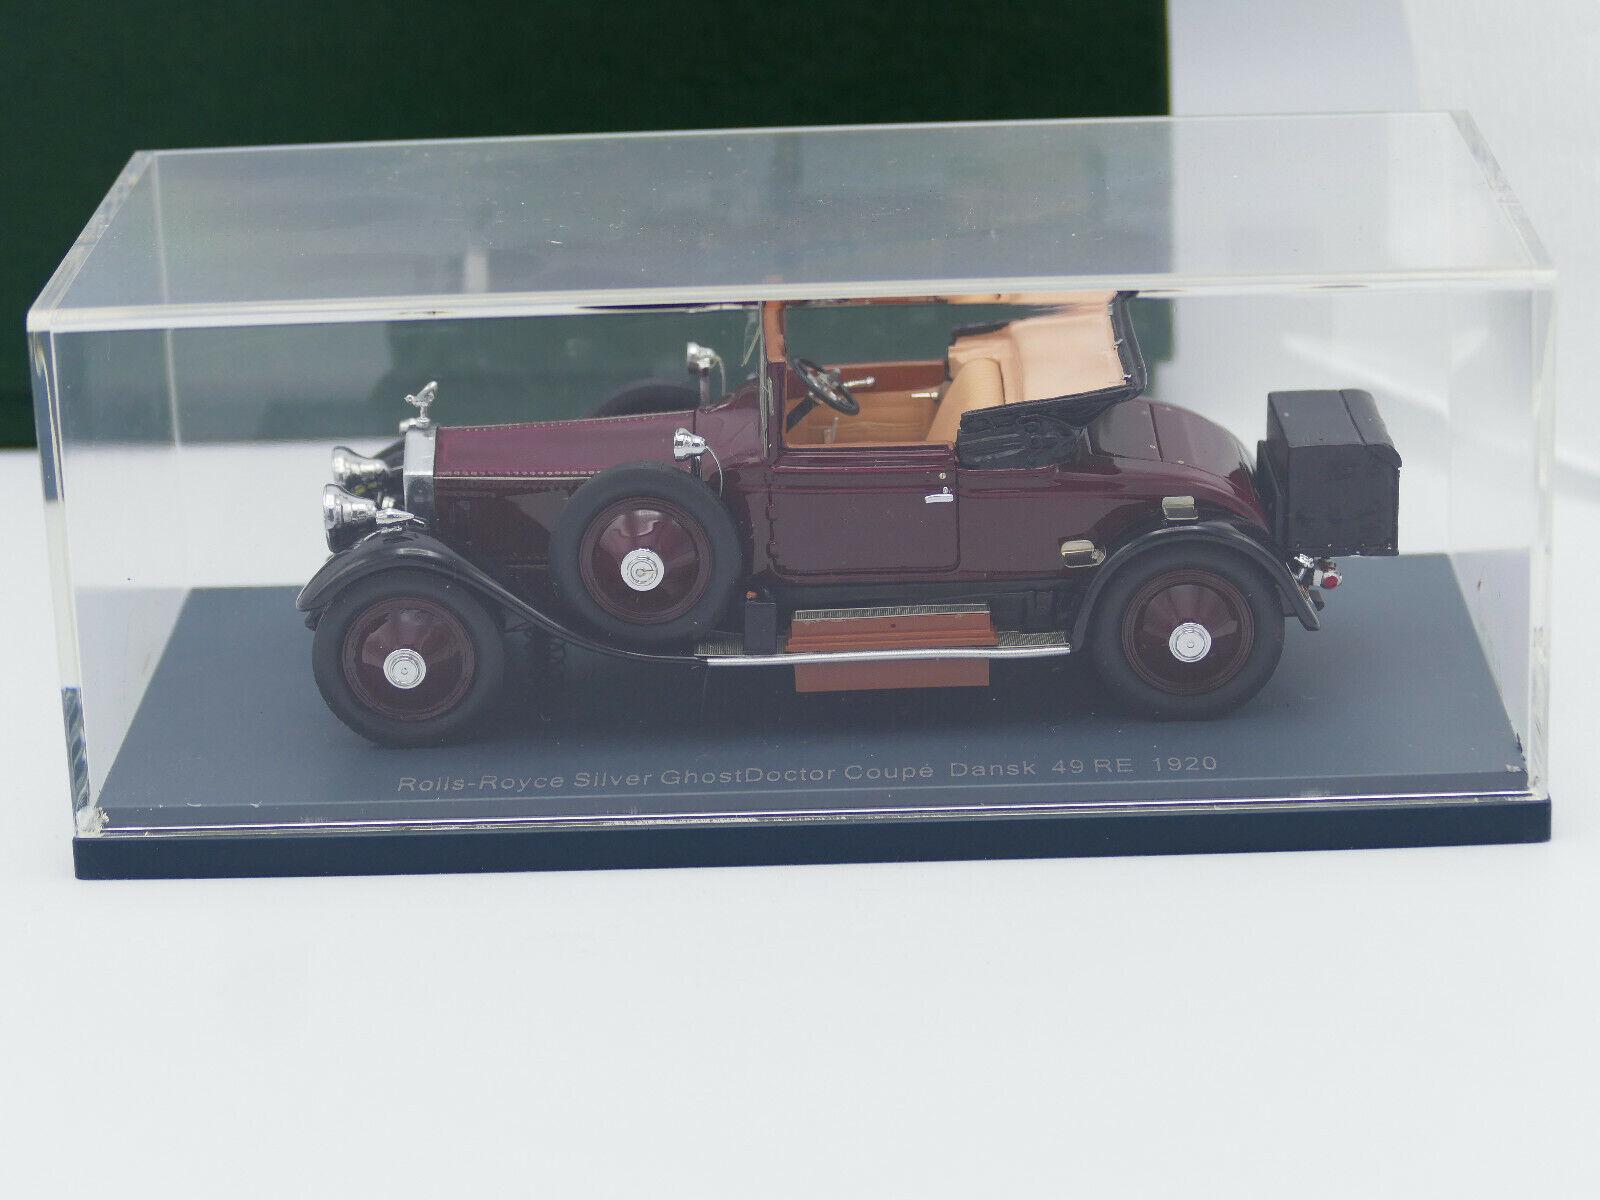 Neo Rolls Royce argento ggost médico Coupe Dansk 1920-Nuevo